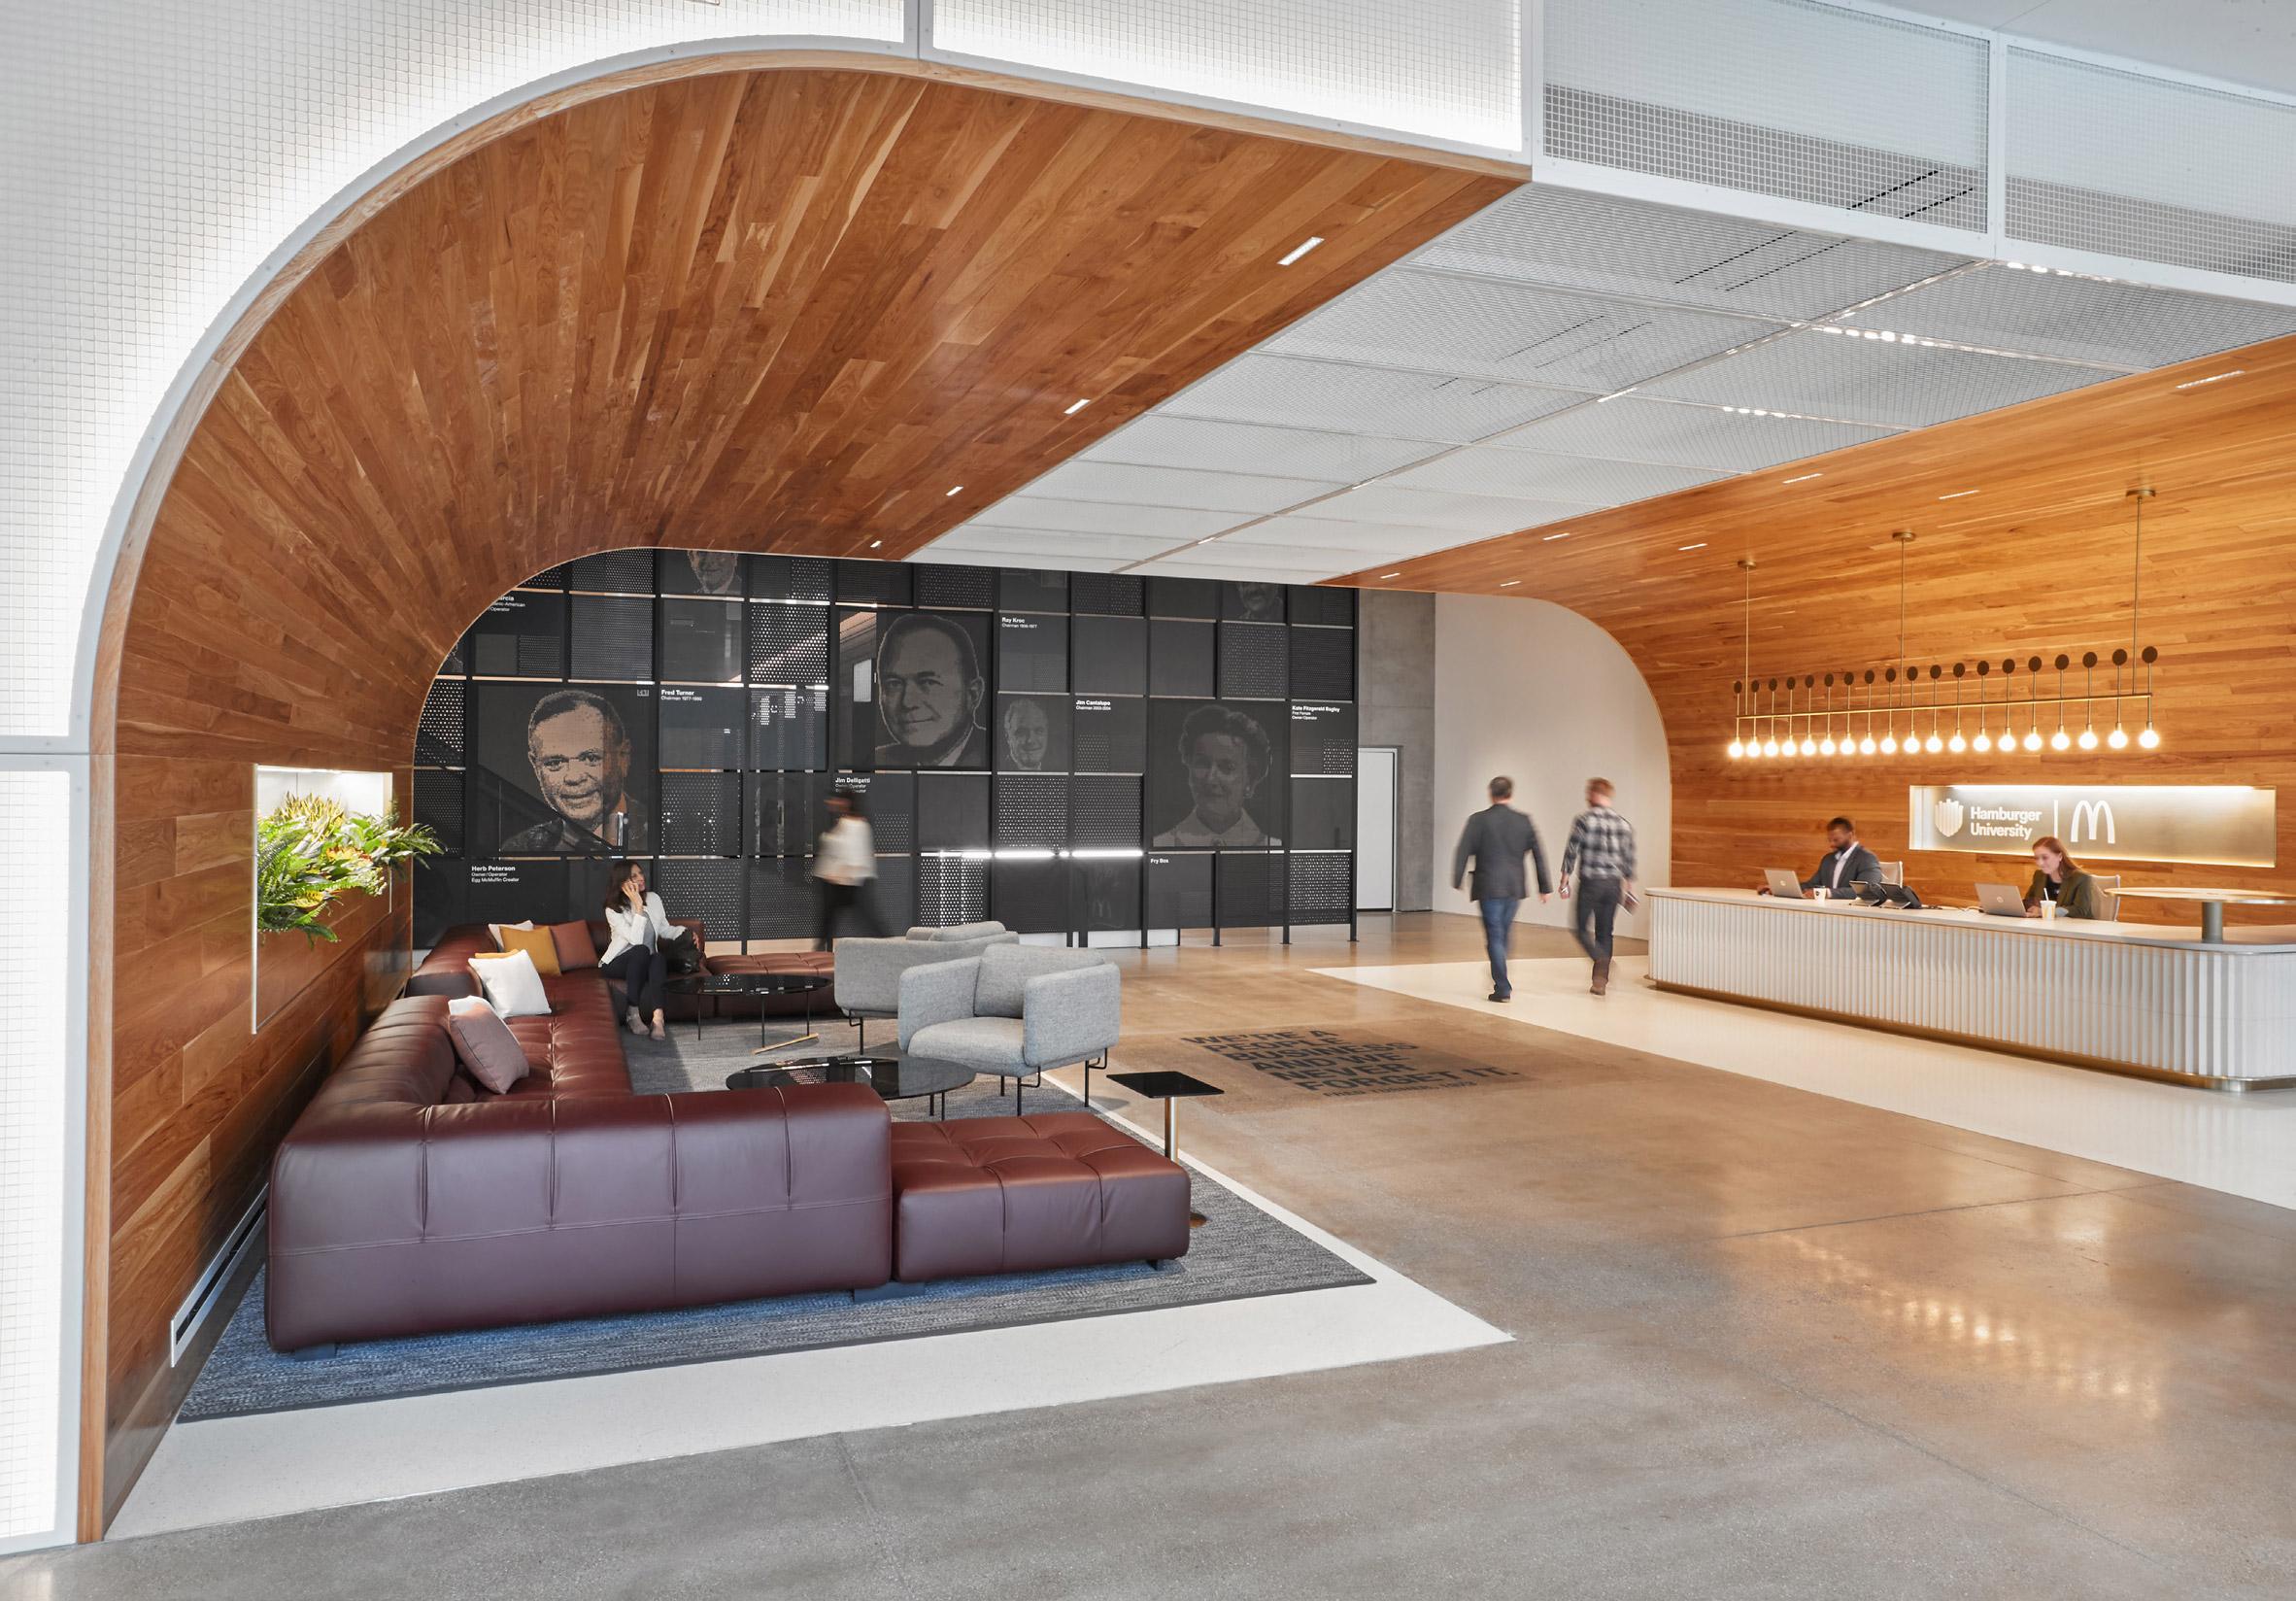 McDonald's Headquarters by IA Interior Architects and Studio O+A